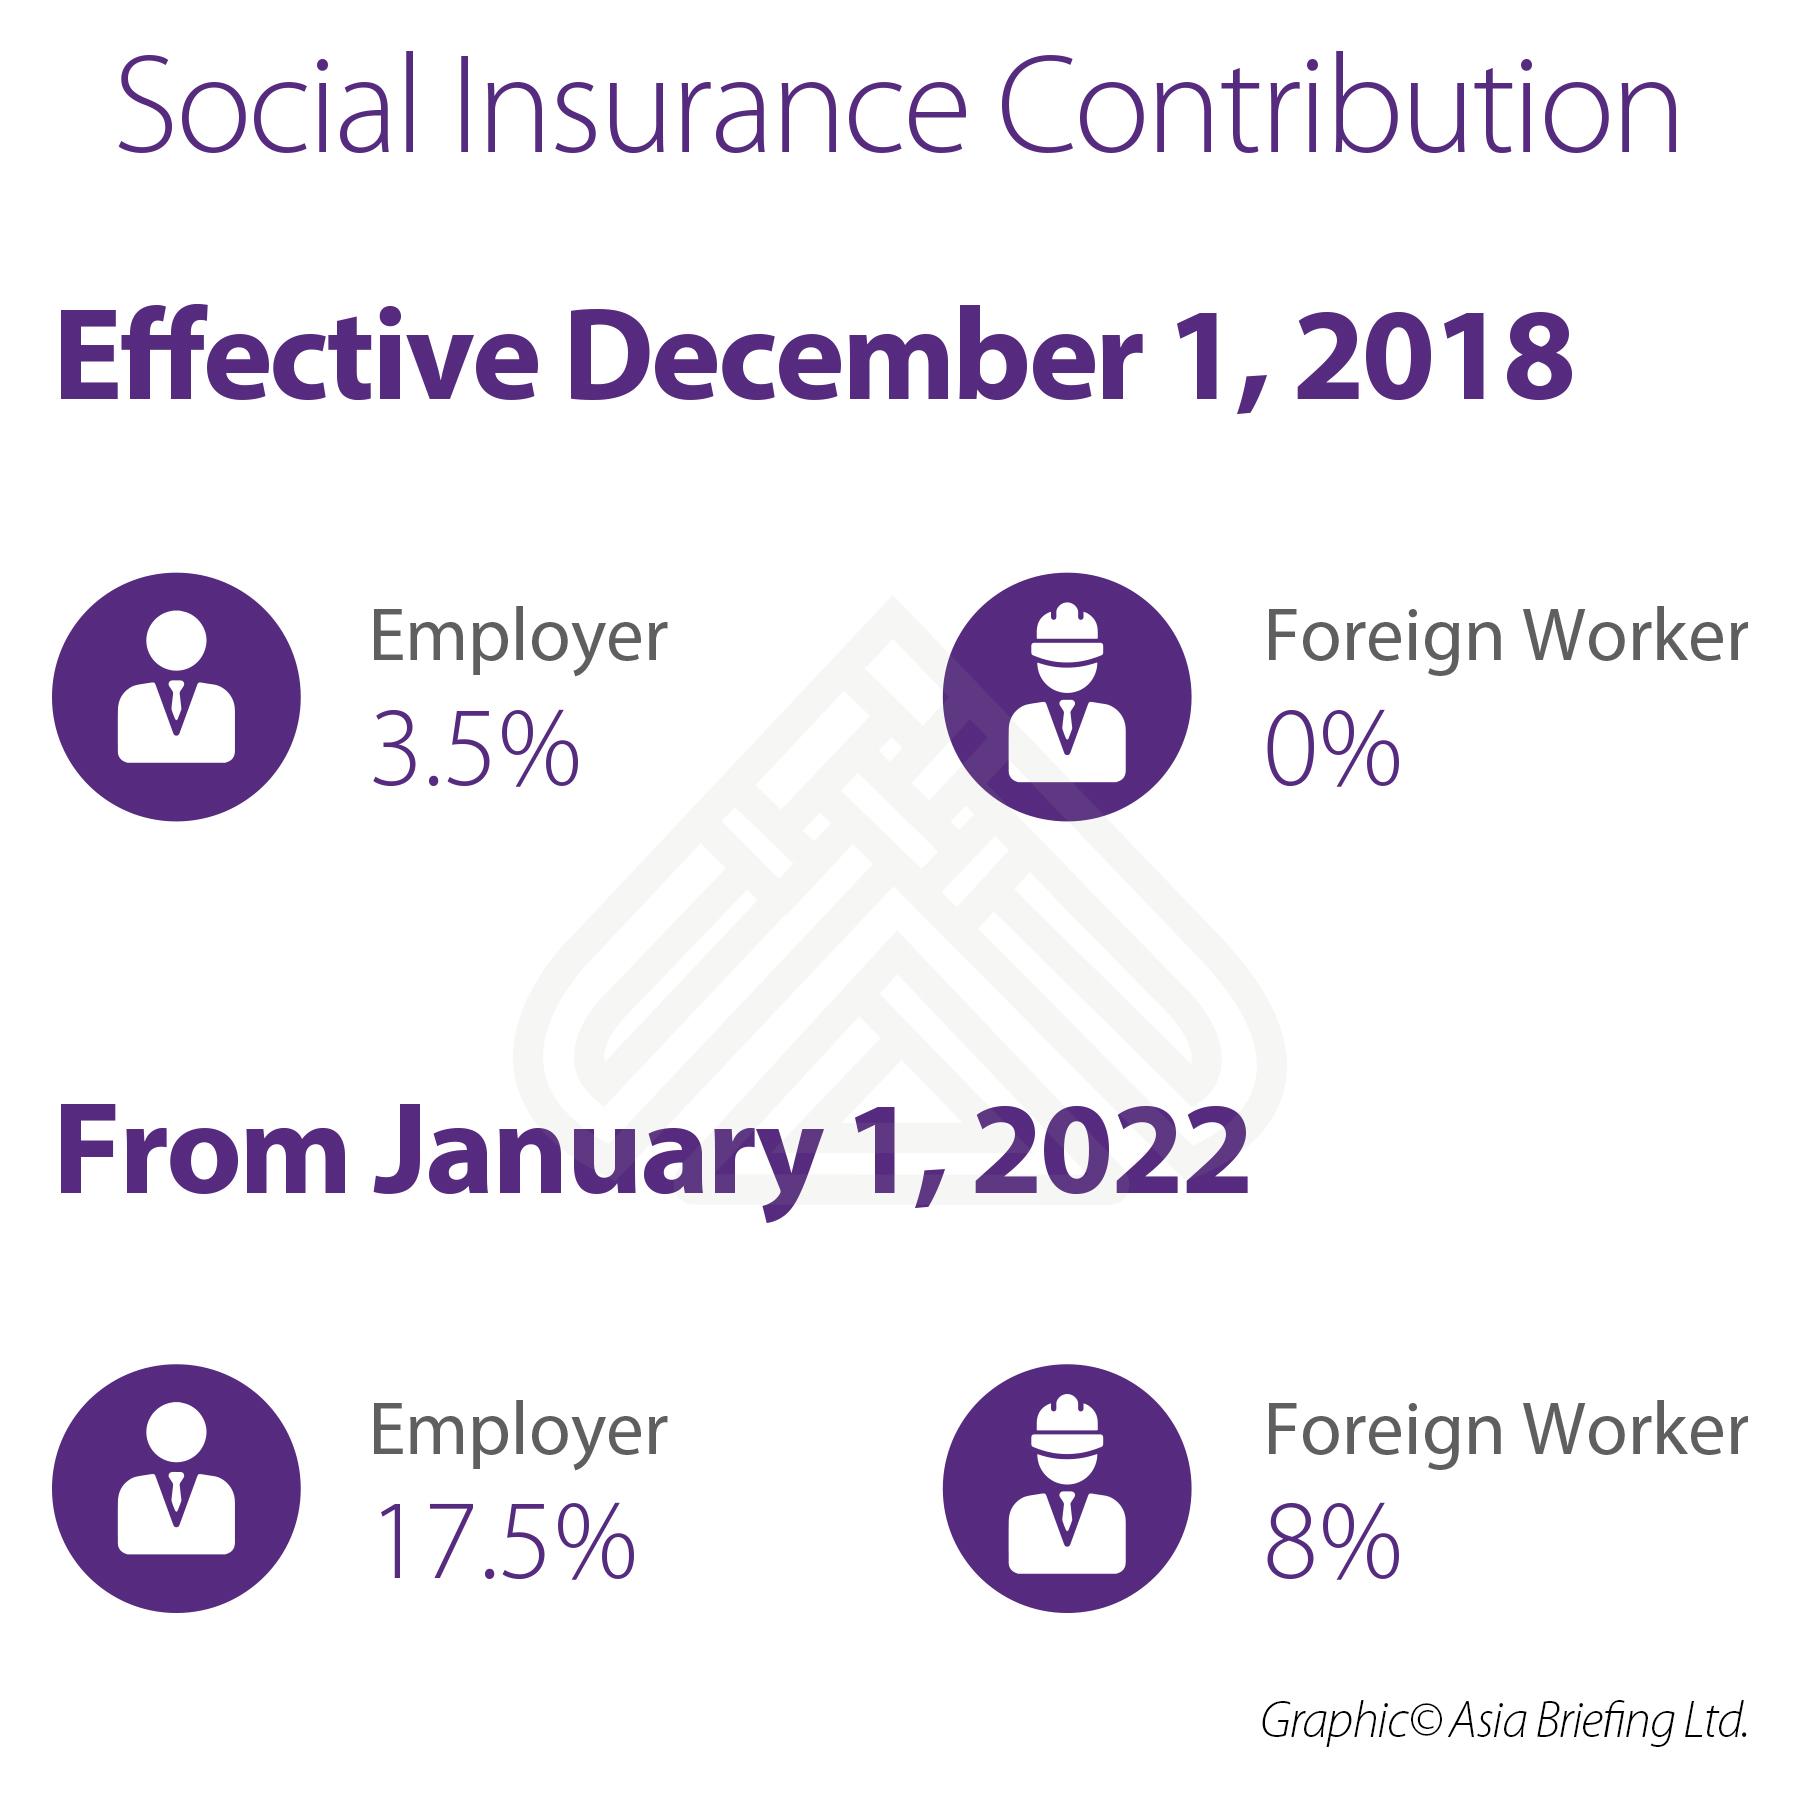 Social Insurance Contribution